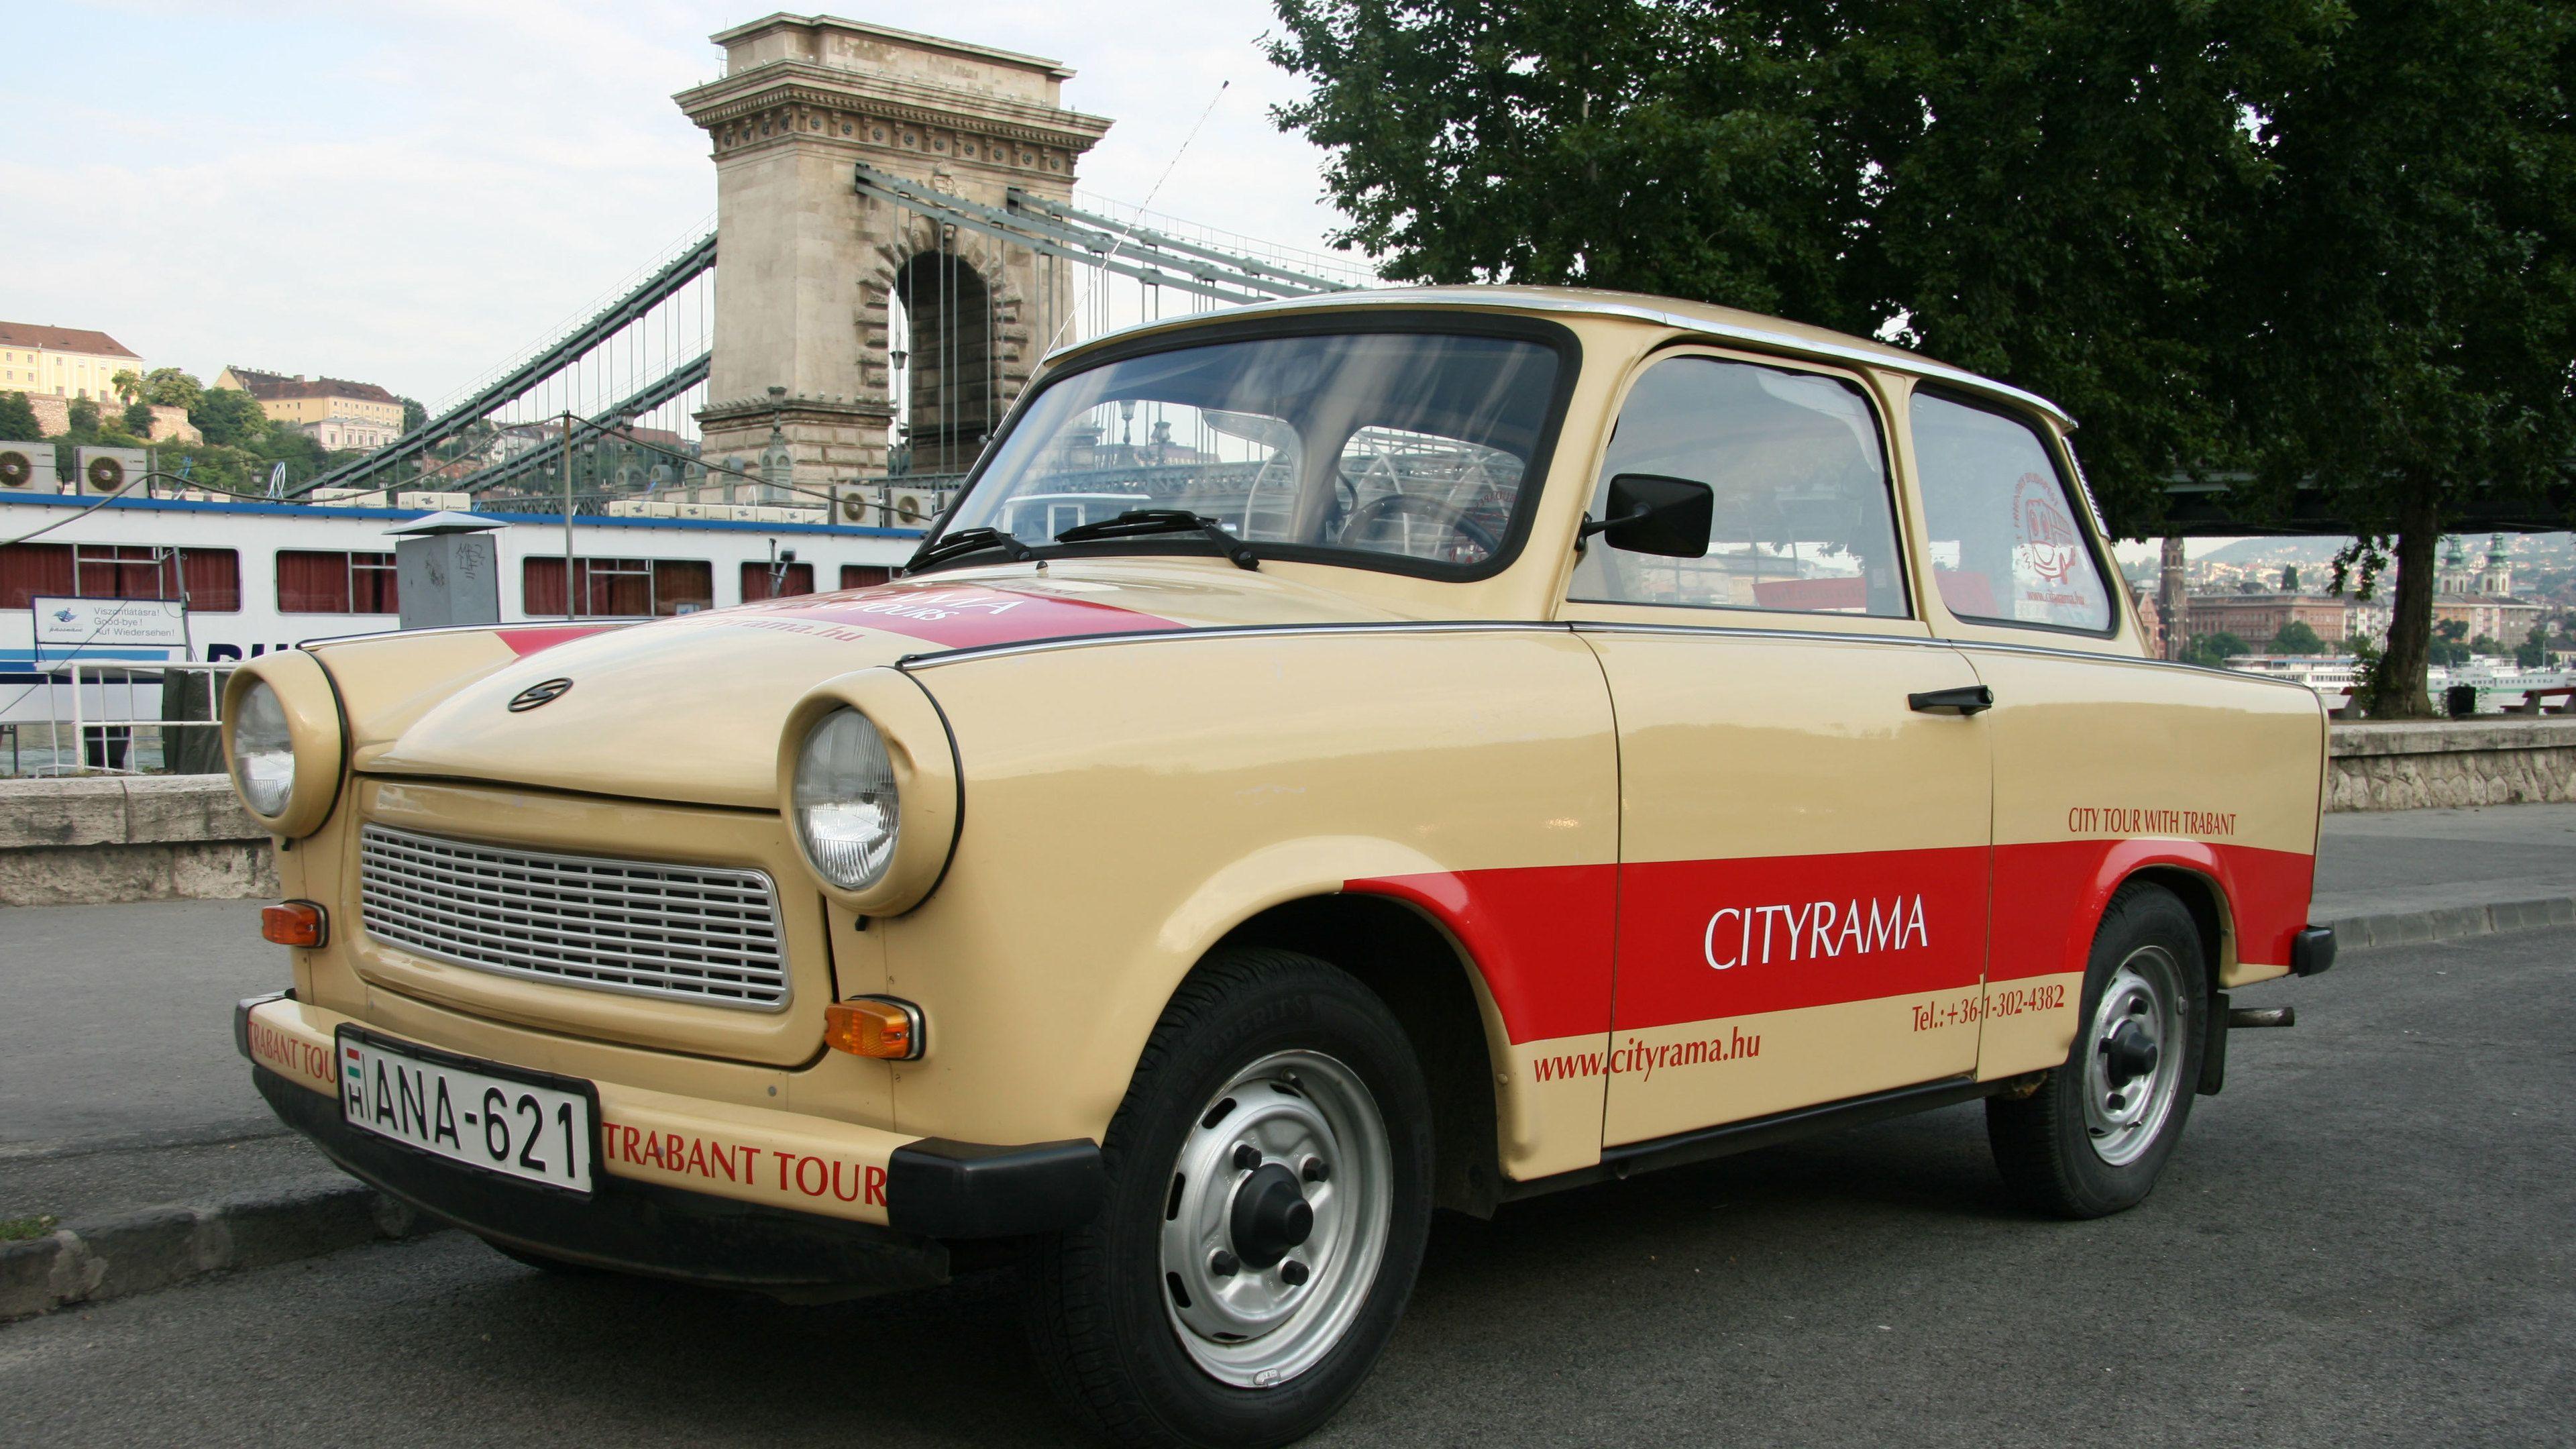 Privat sightseeingtur i en Trabant-bil